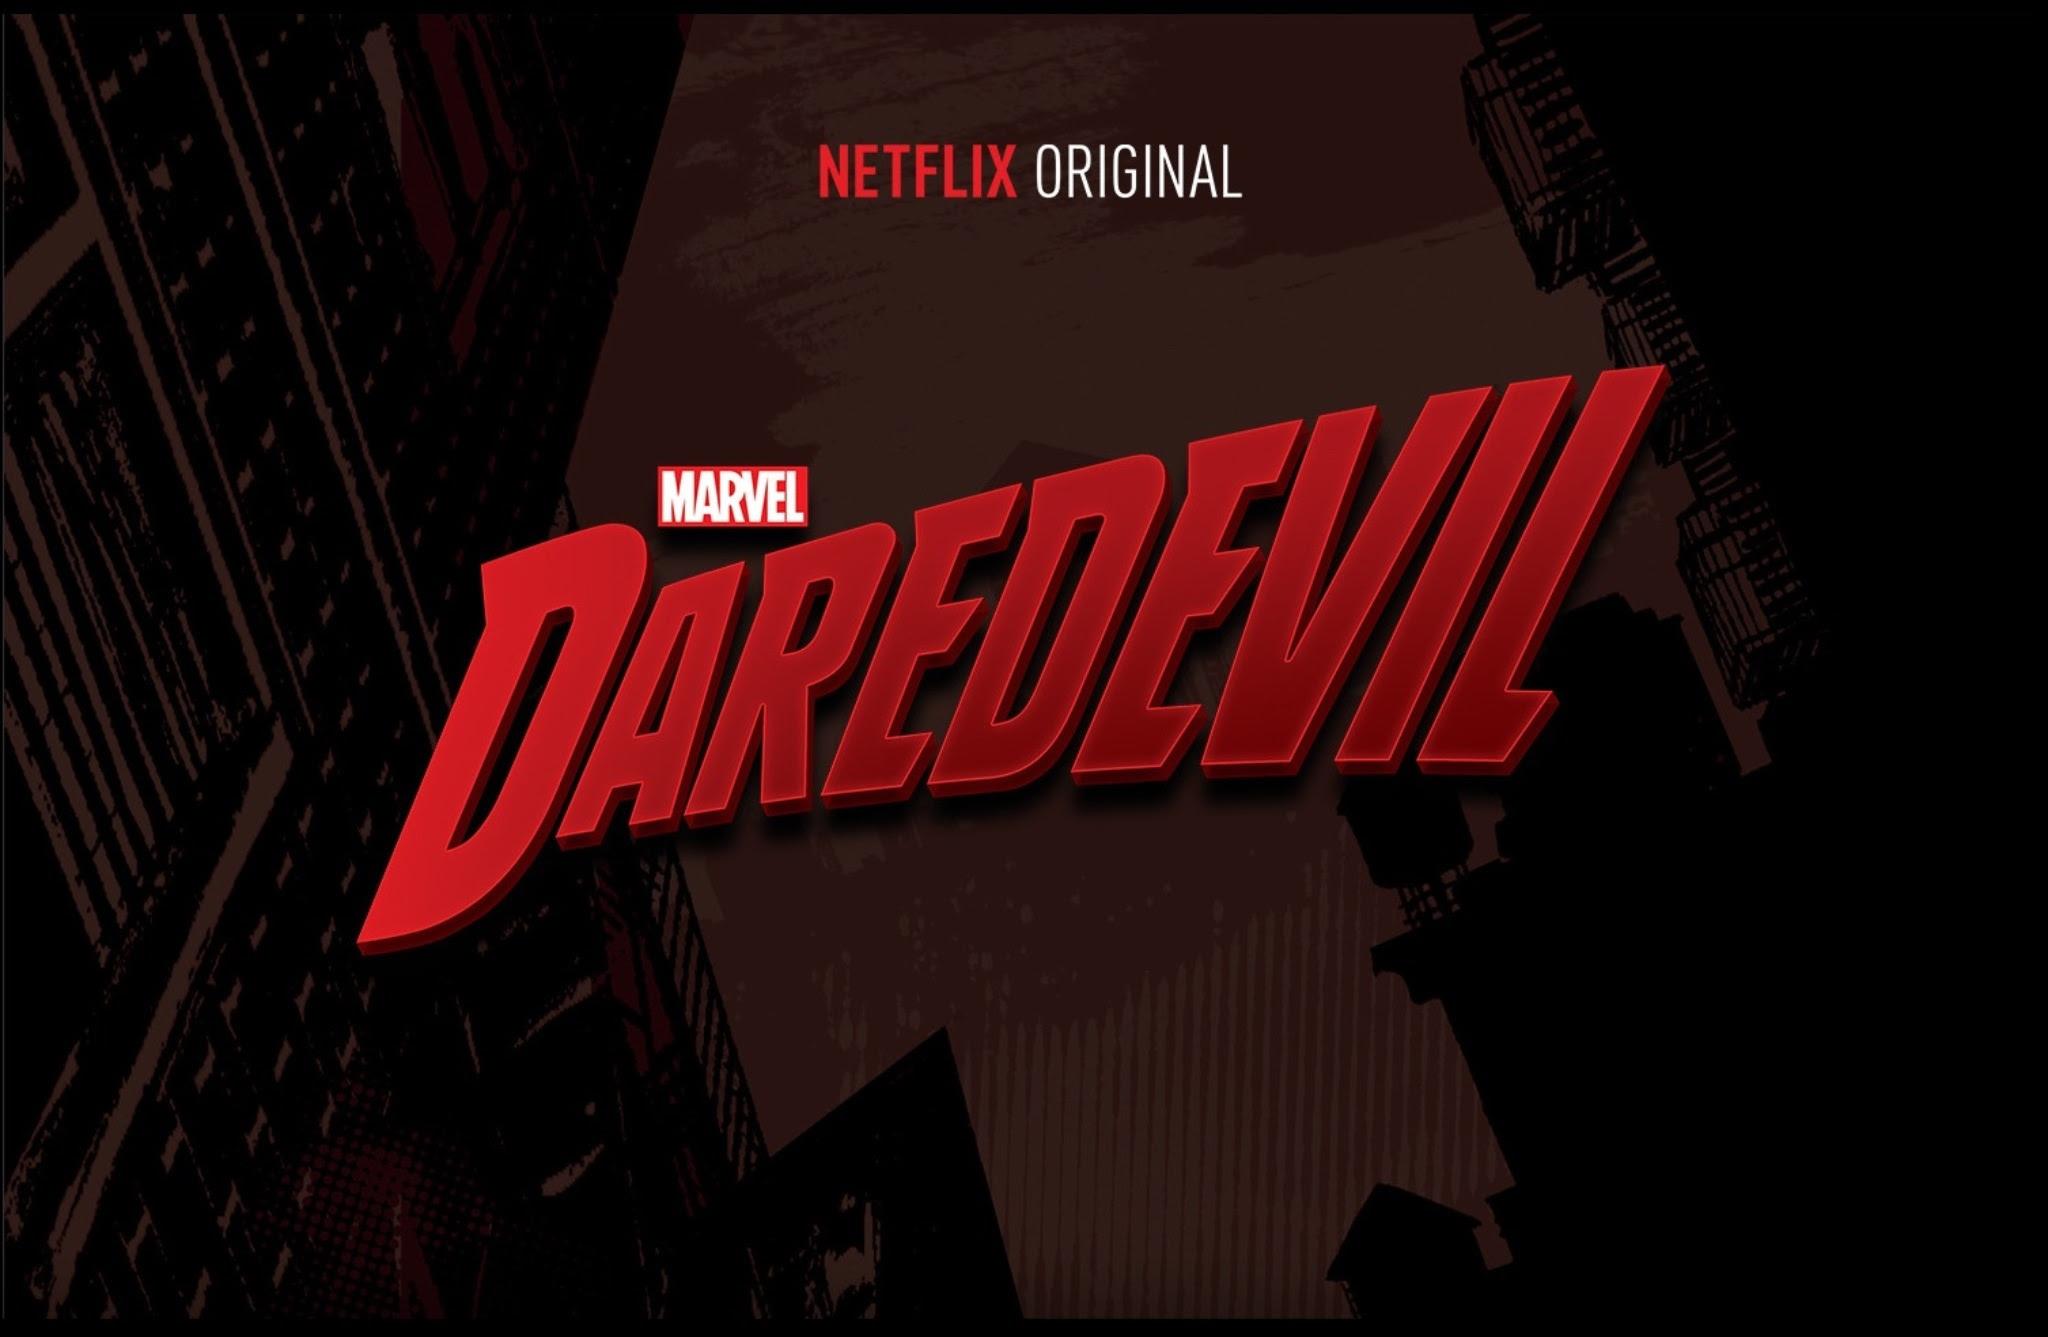 daredevil, netflix, marvel, avengers, noticias de series, television